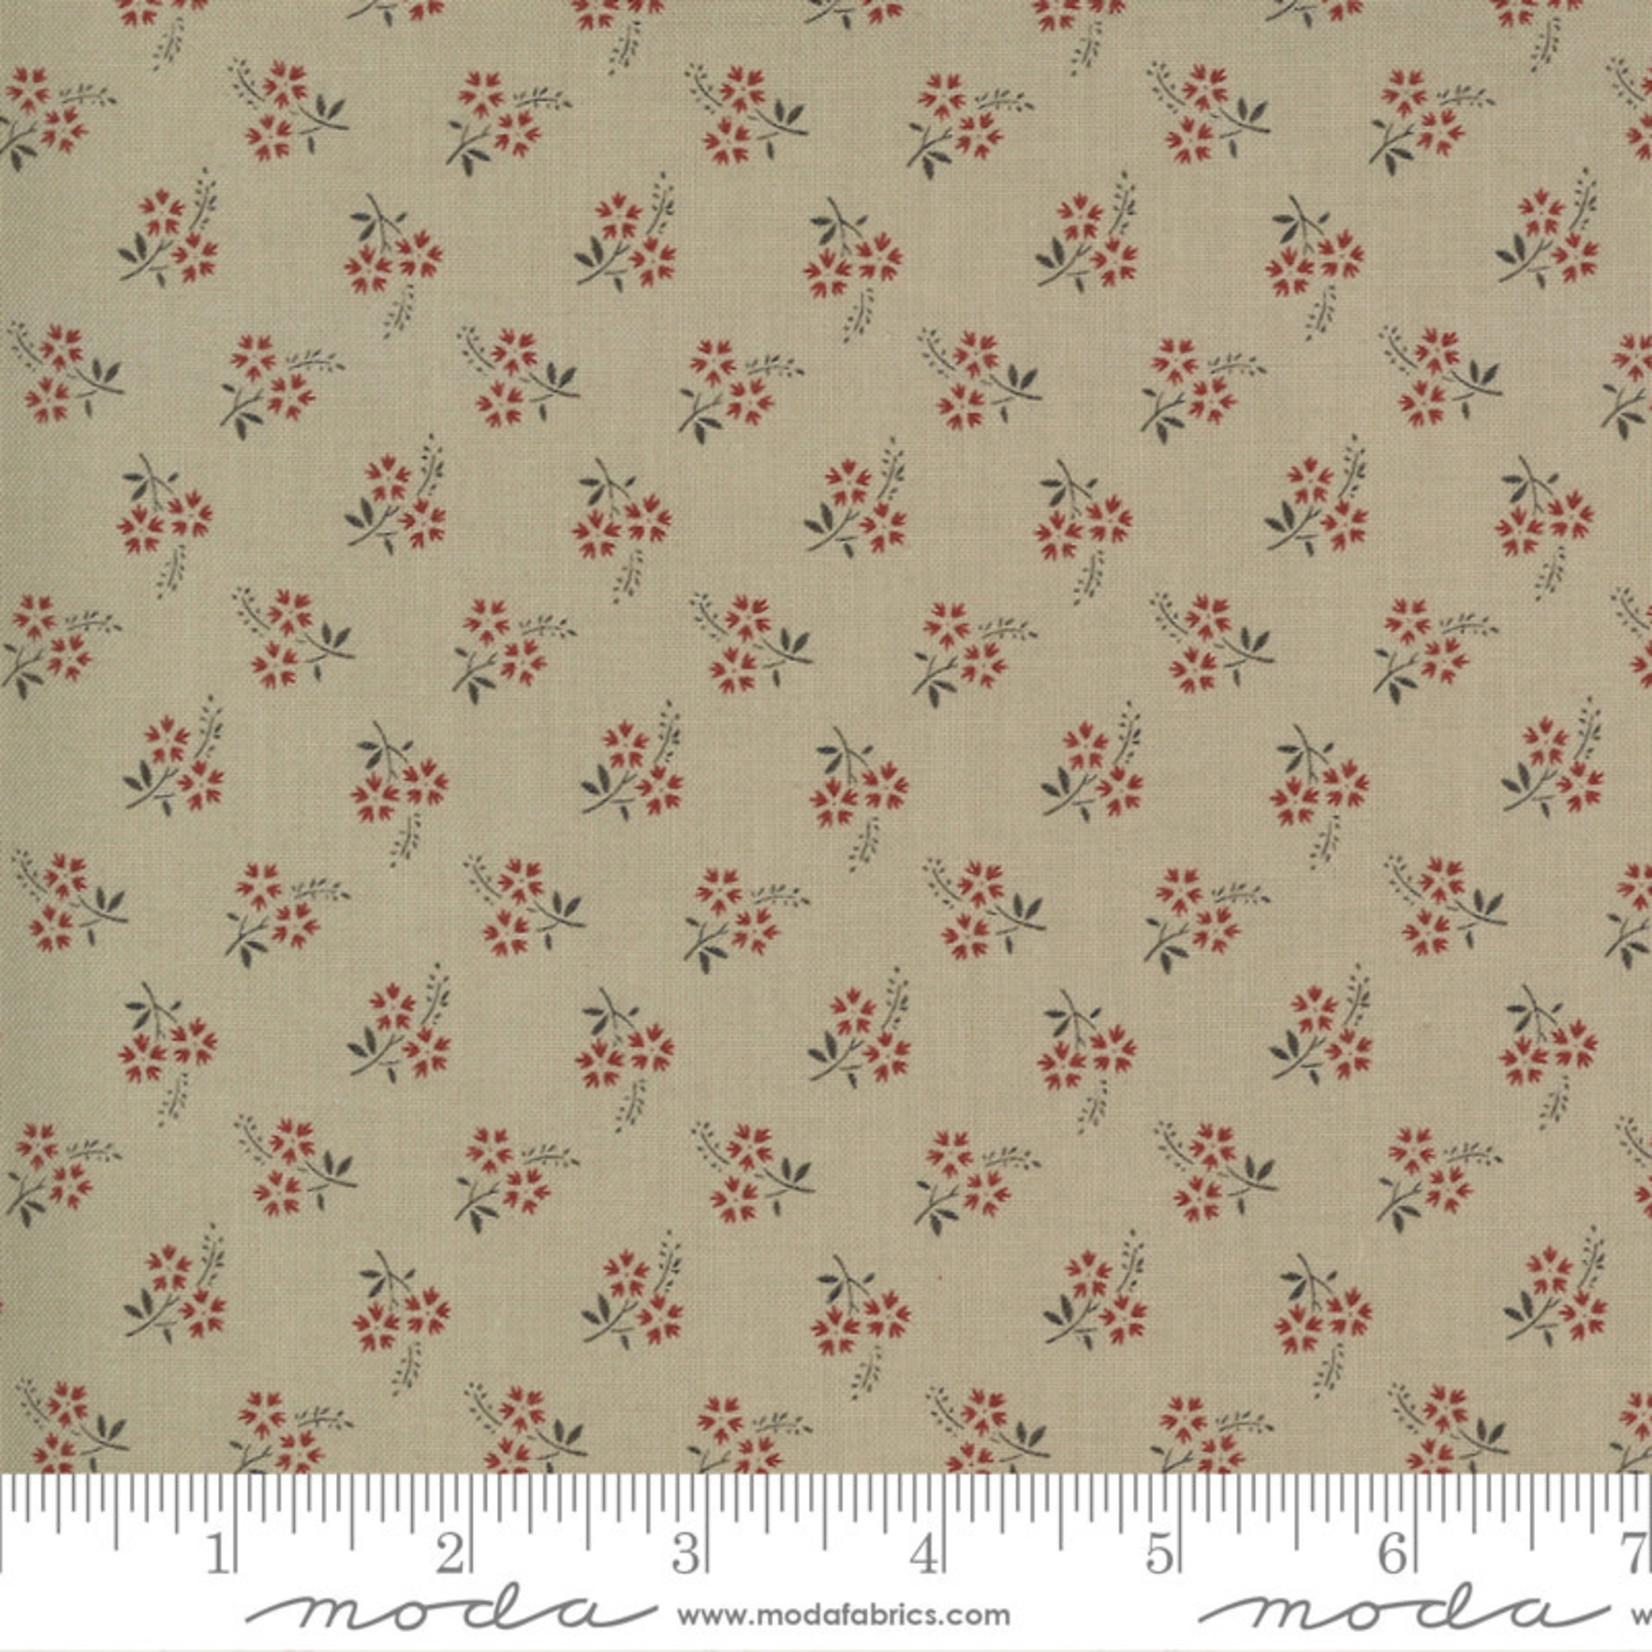 French General Jardins De Fleurs, Tuileries, Roche 13897-20 $0.20 per cm or $20/m